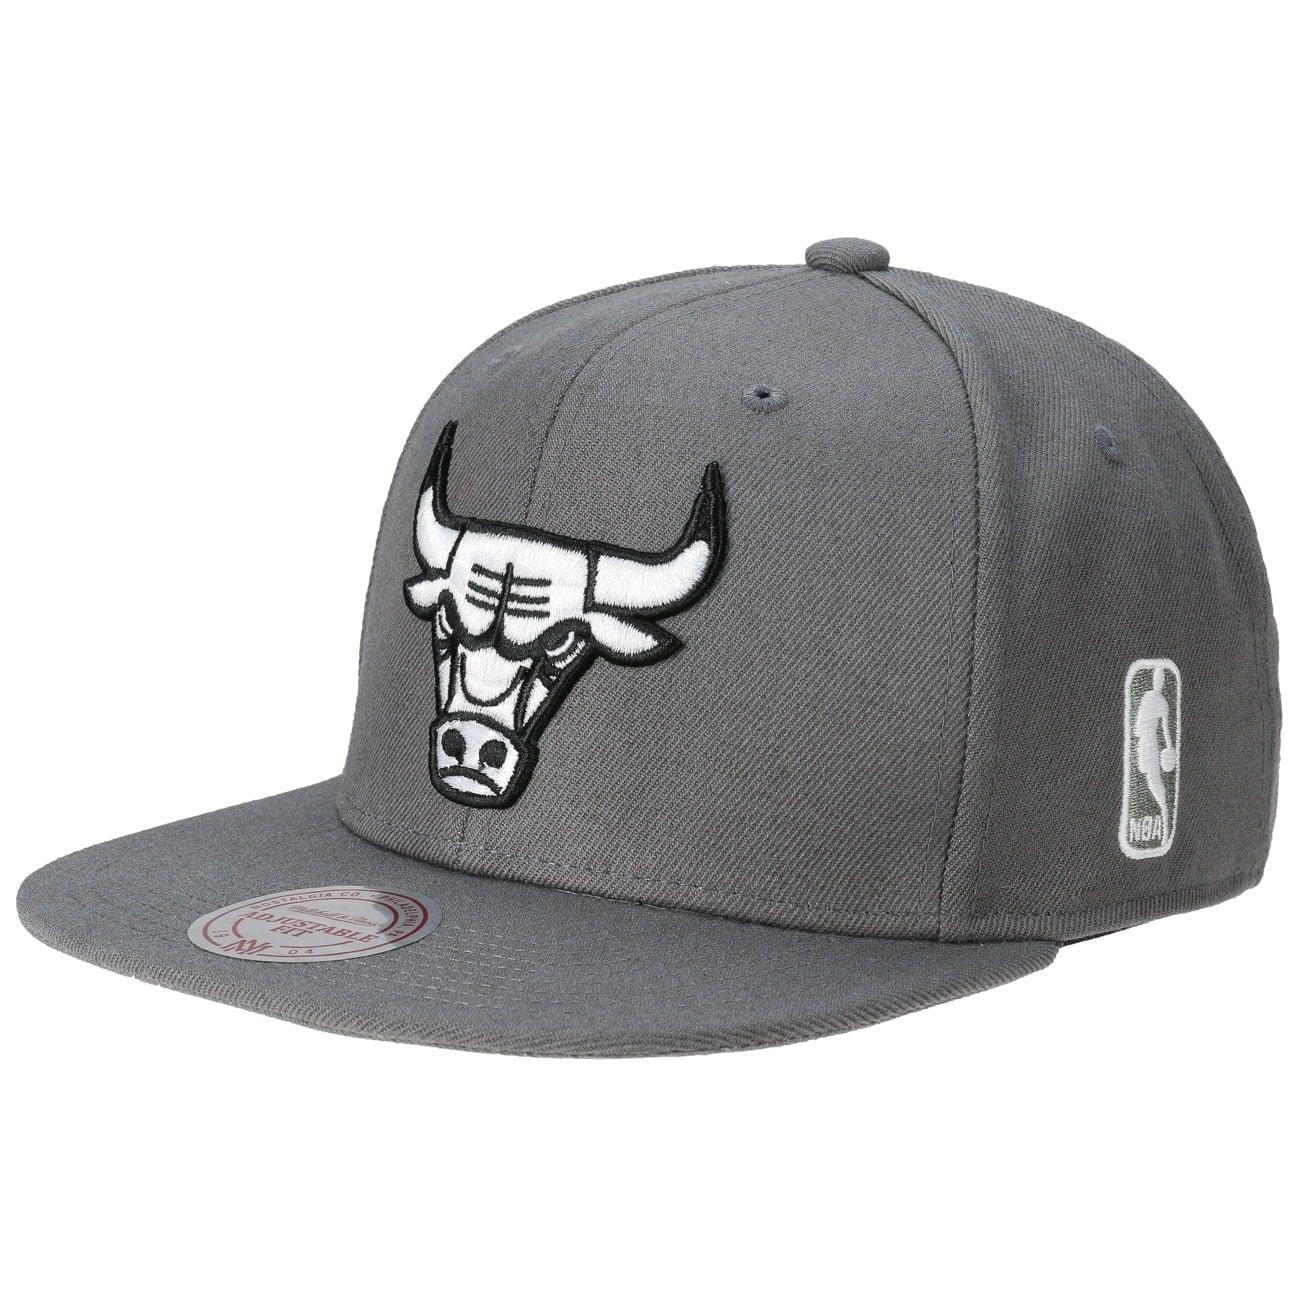 B&W Team Base Bulls Cap by Mitchell & Ness  snapback cap